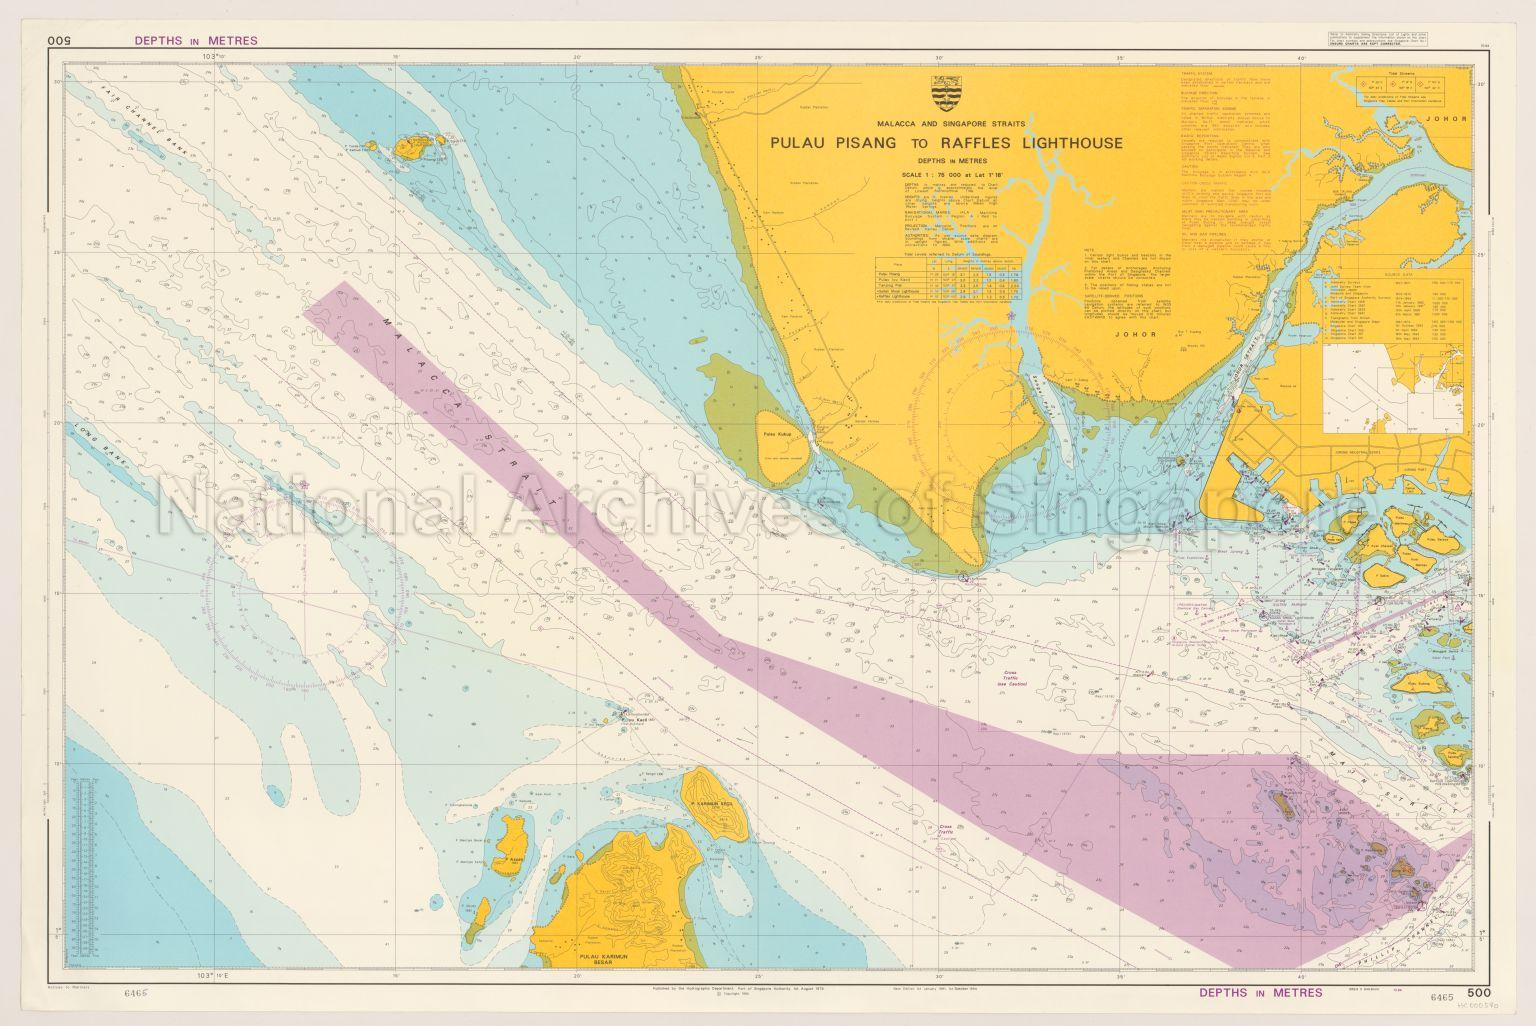 Malacca On World Map.Malacca And Singapore Straits Pulau Pisang To Raffles